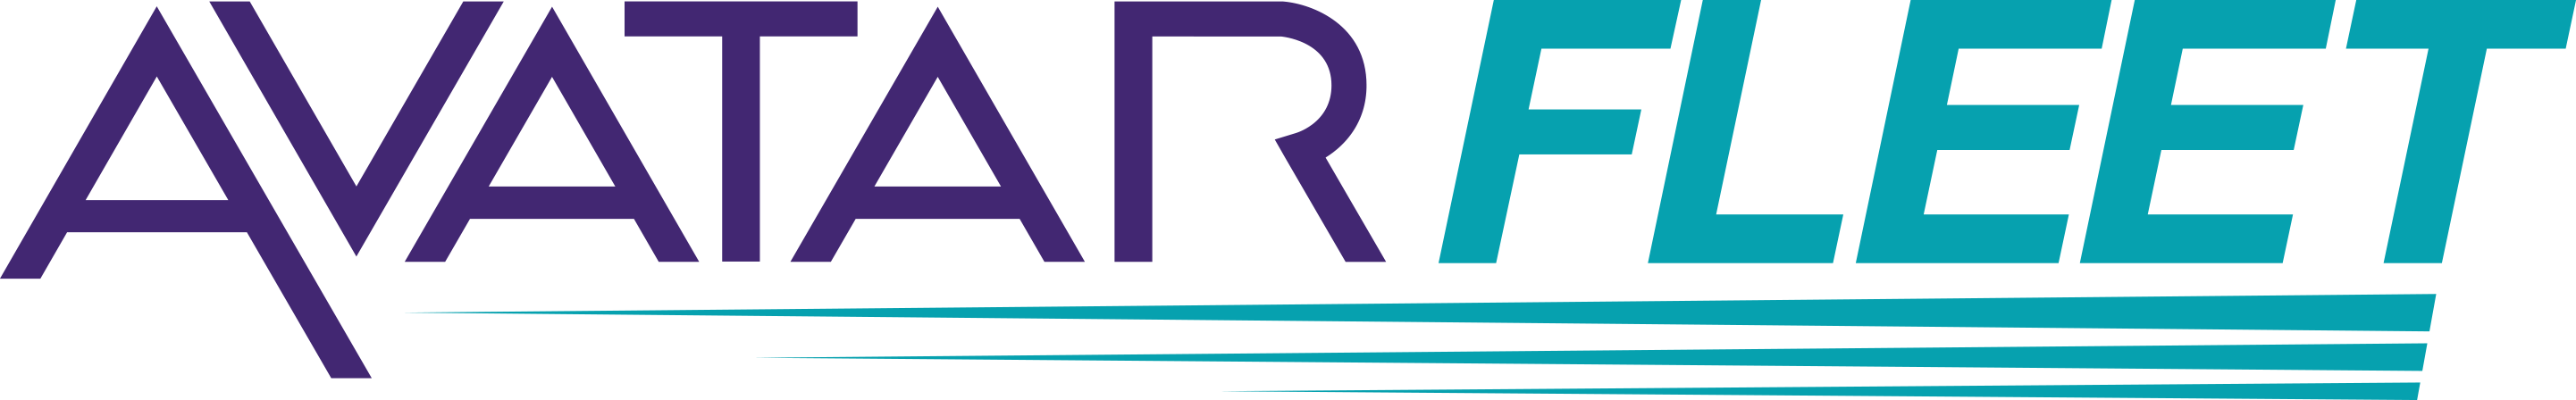 avatar-fleet-logo (7)[1]